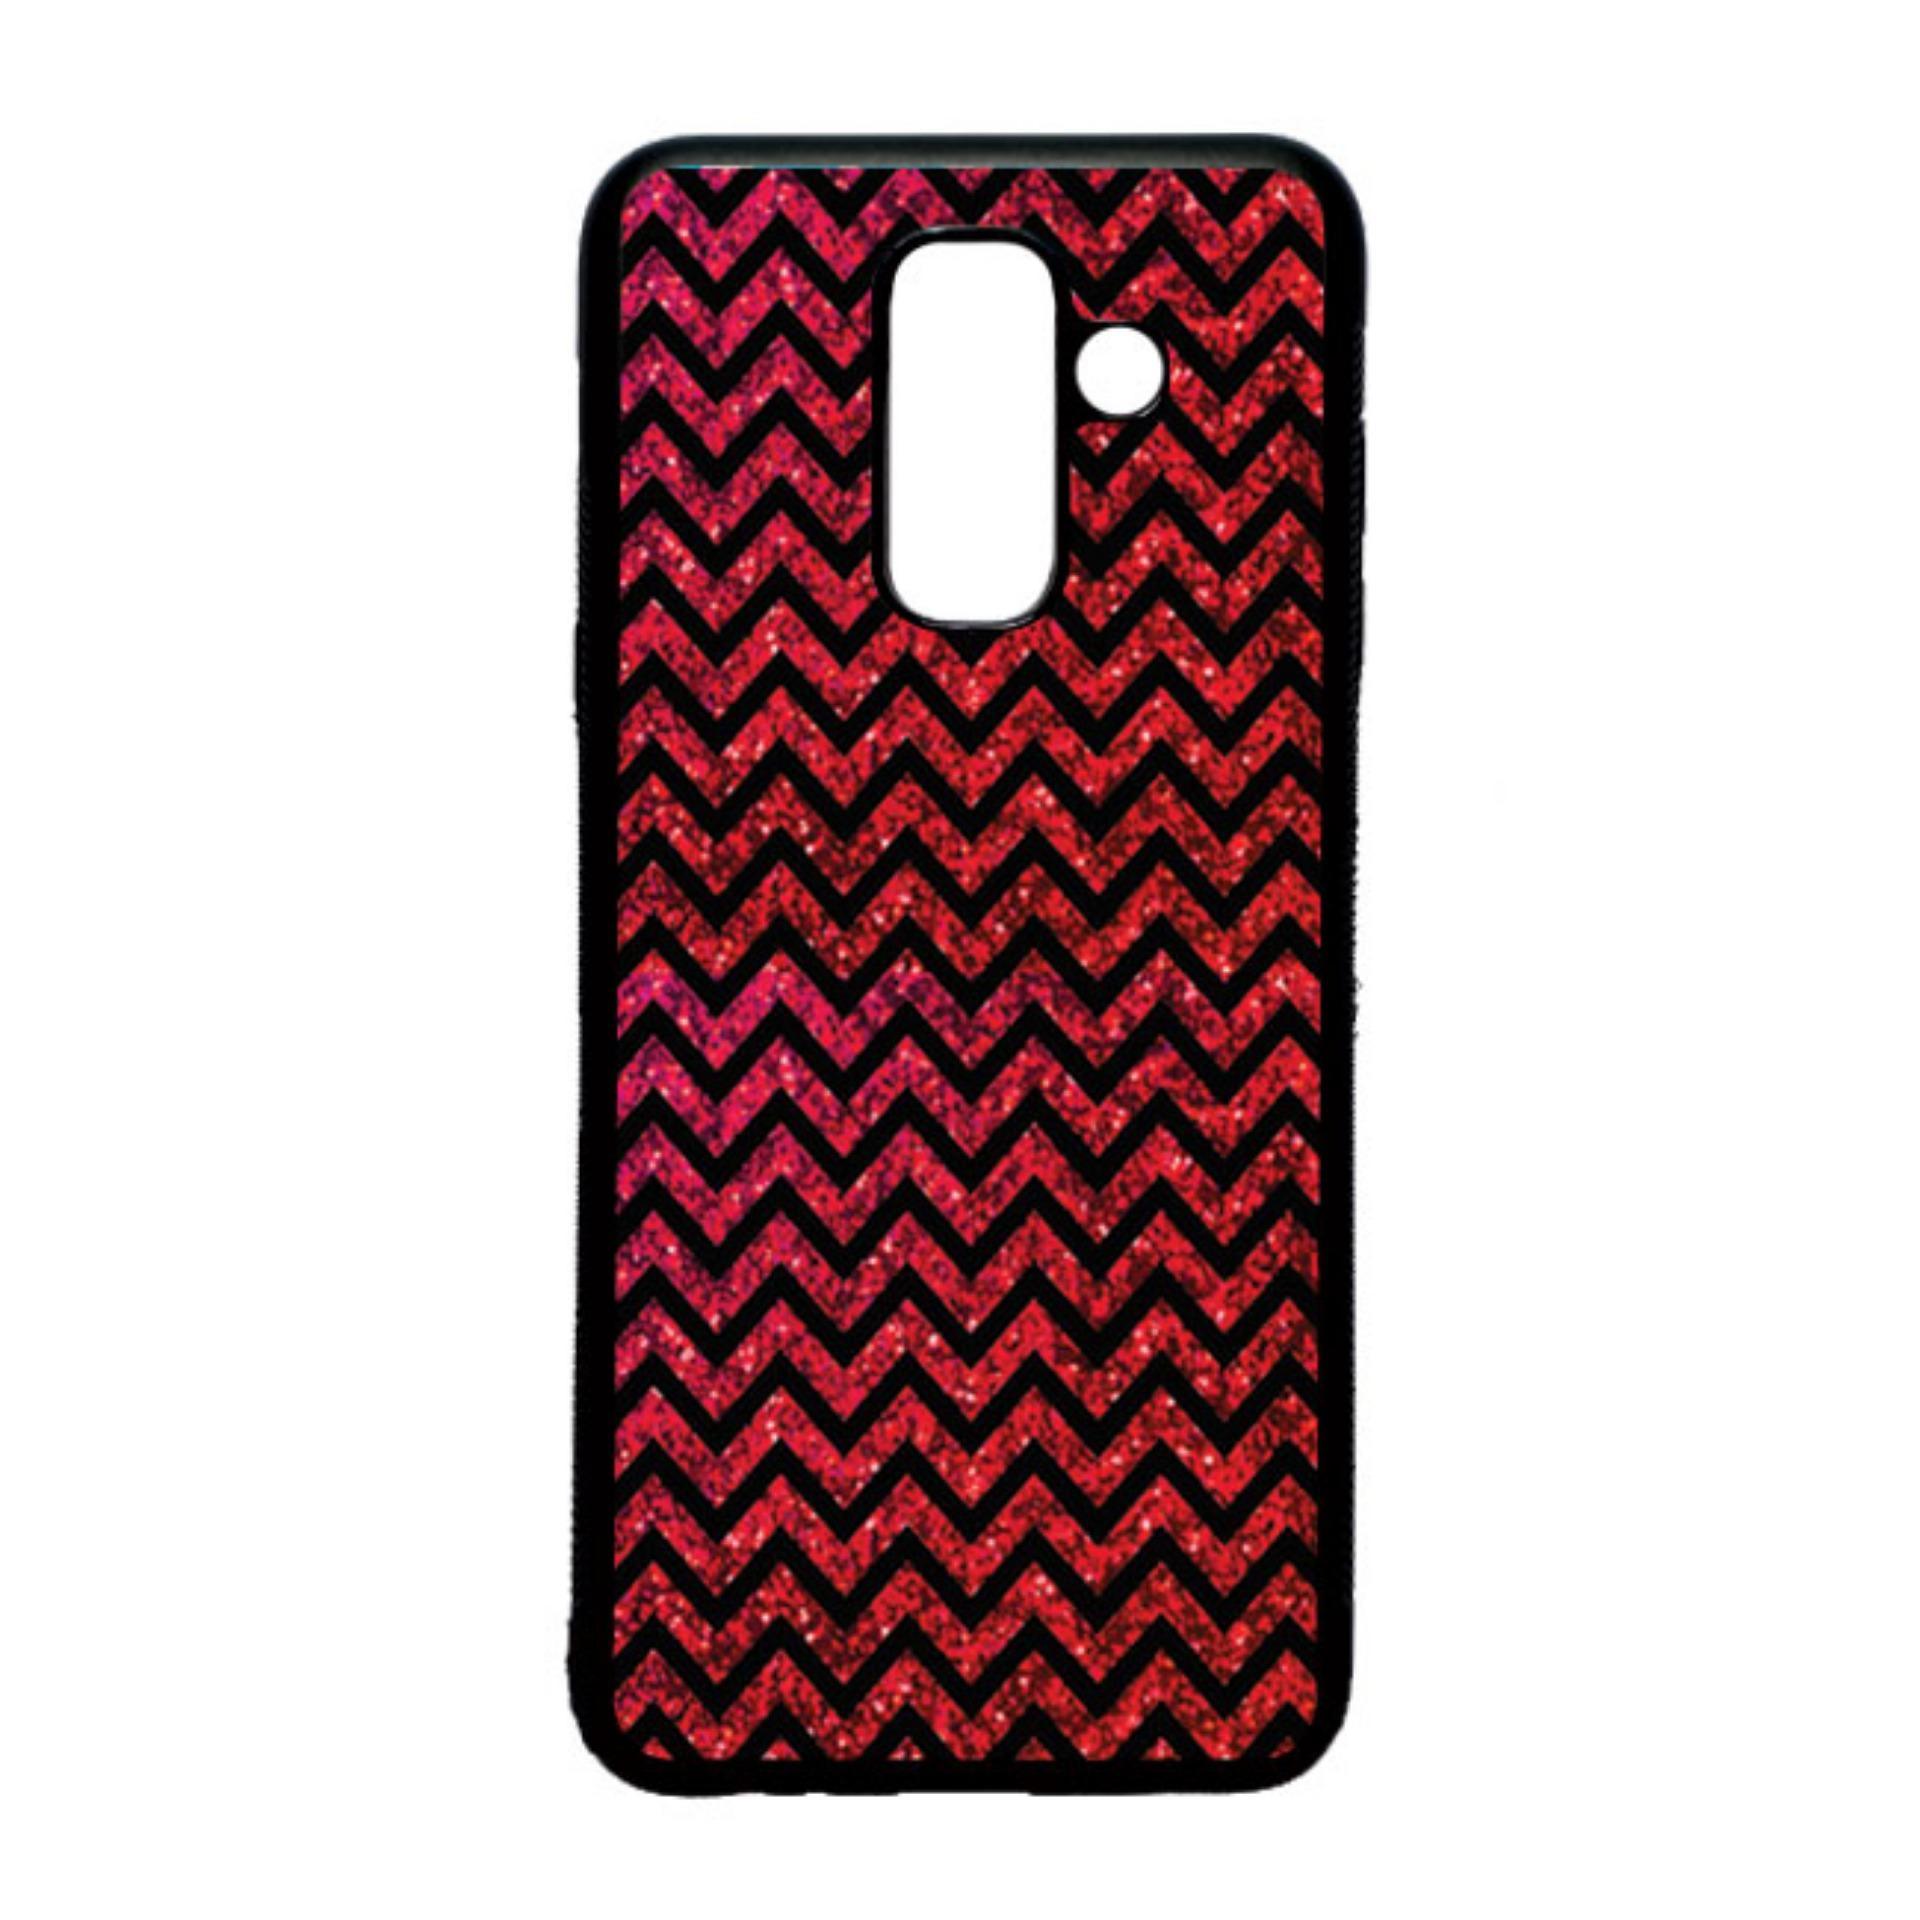 HEAVENCASE Case Casing Samsung Galaxy A6+ / A6 Plus Case Softcase Hitam Motif Batik Chevy 27